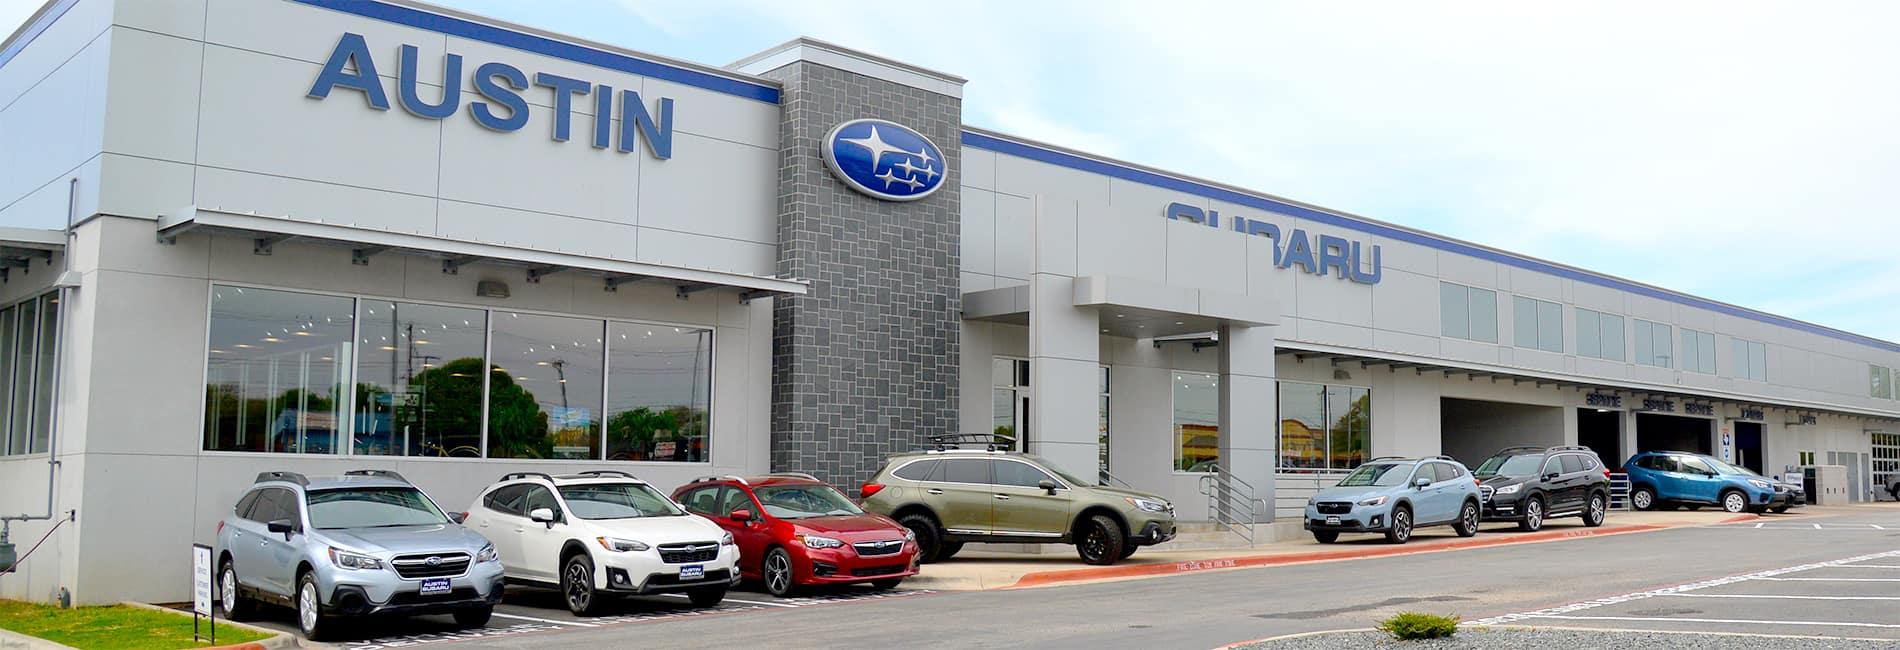 About Austin Subaru